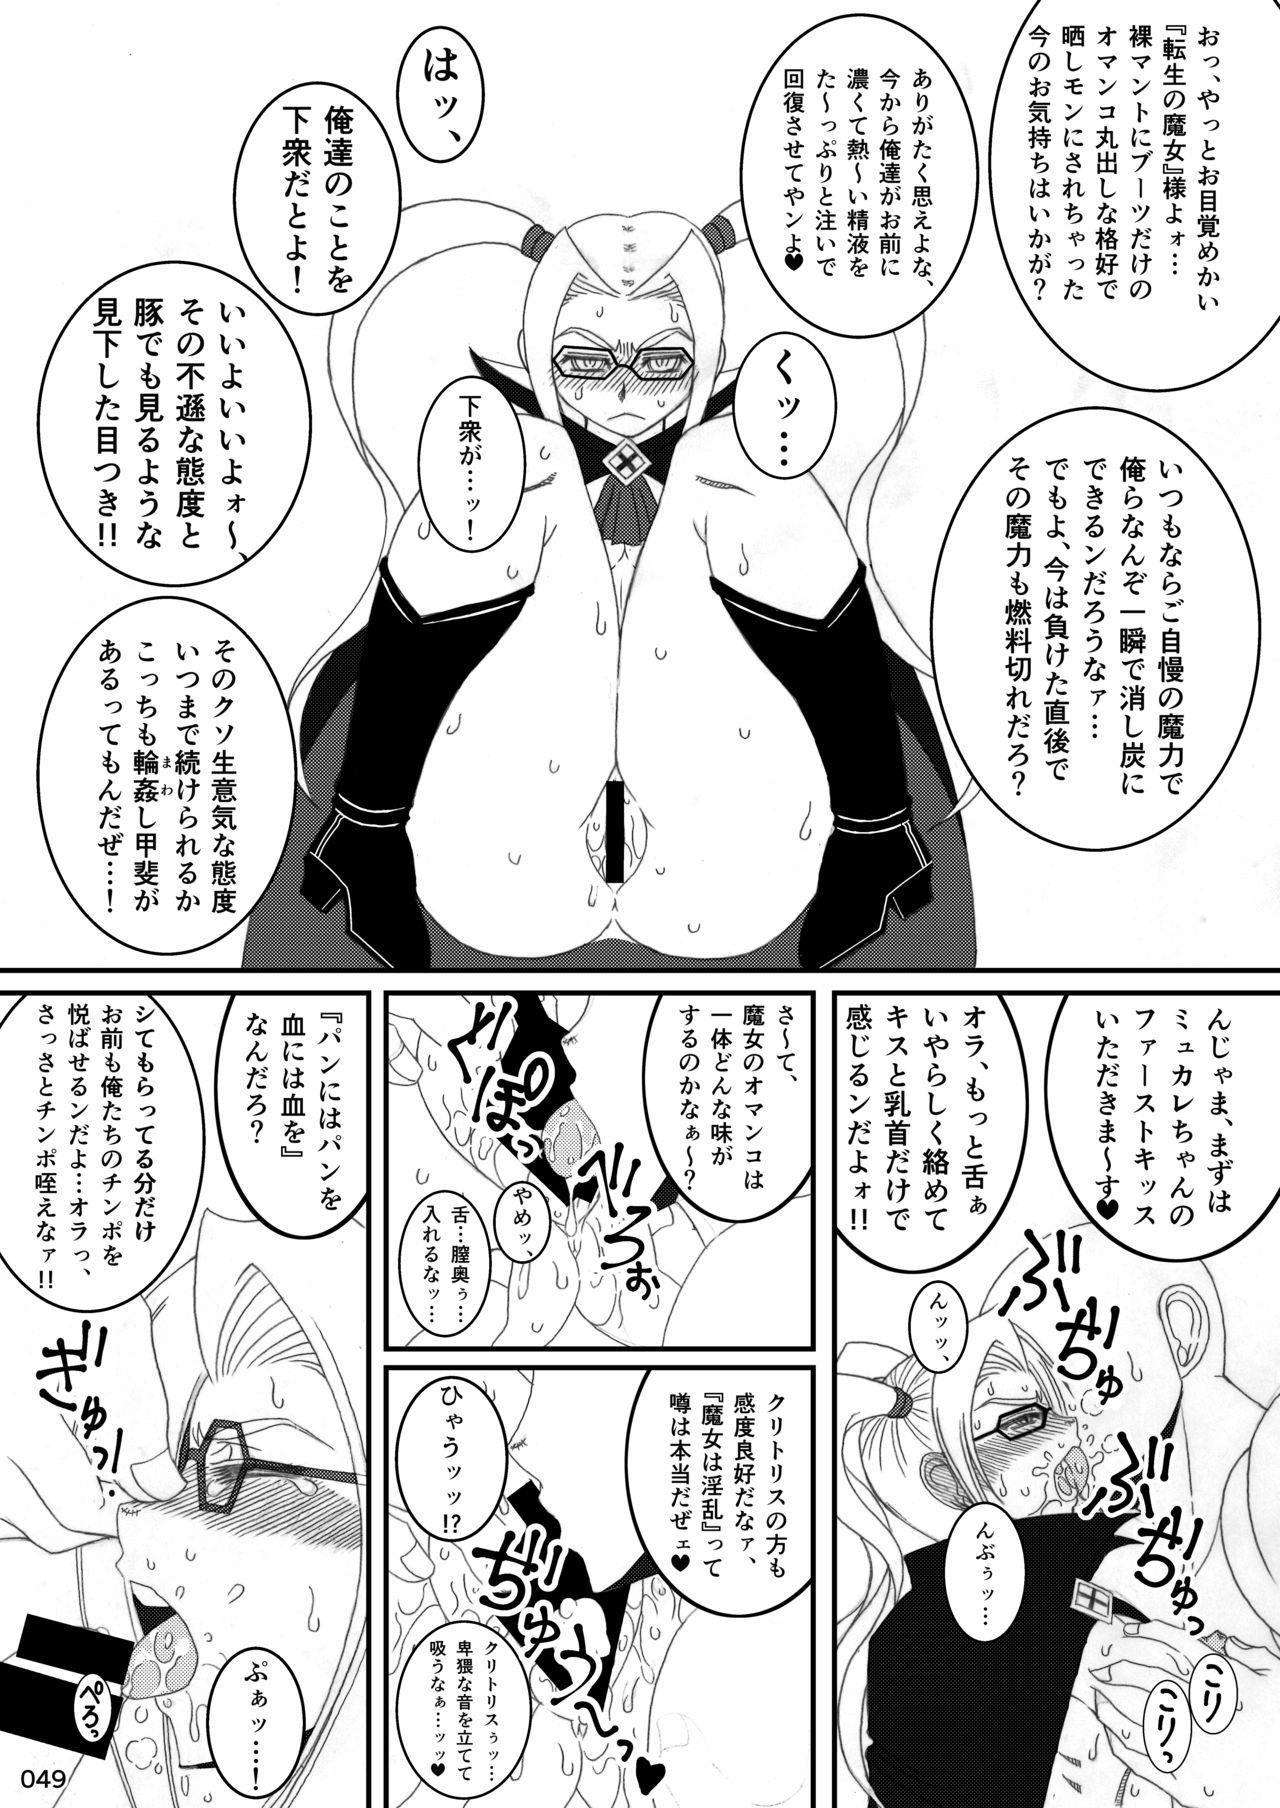 Akatsuki Blitzkampf & EN-1 Perfekt Welt Gangbang Anthology 48